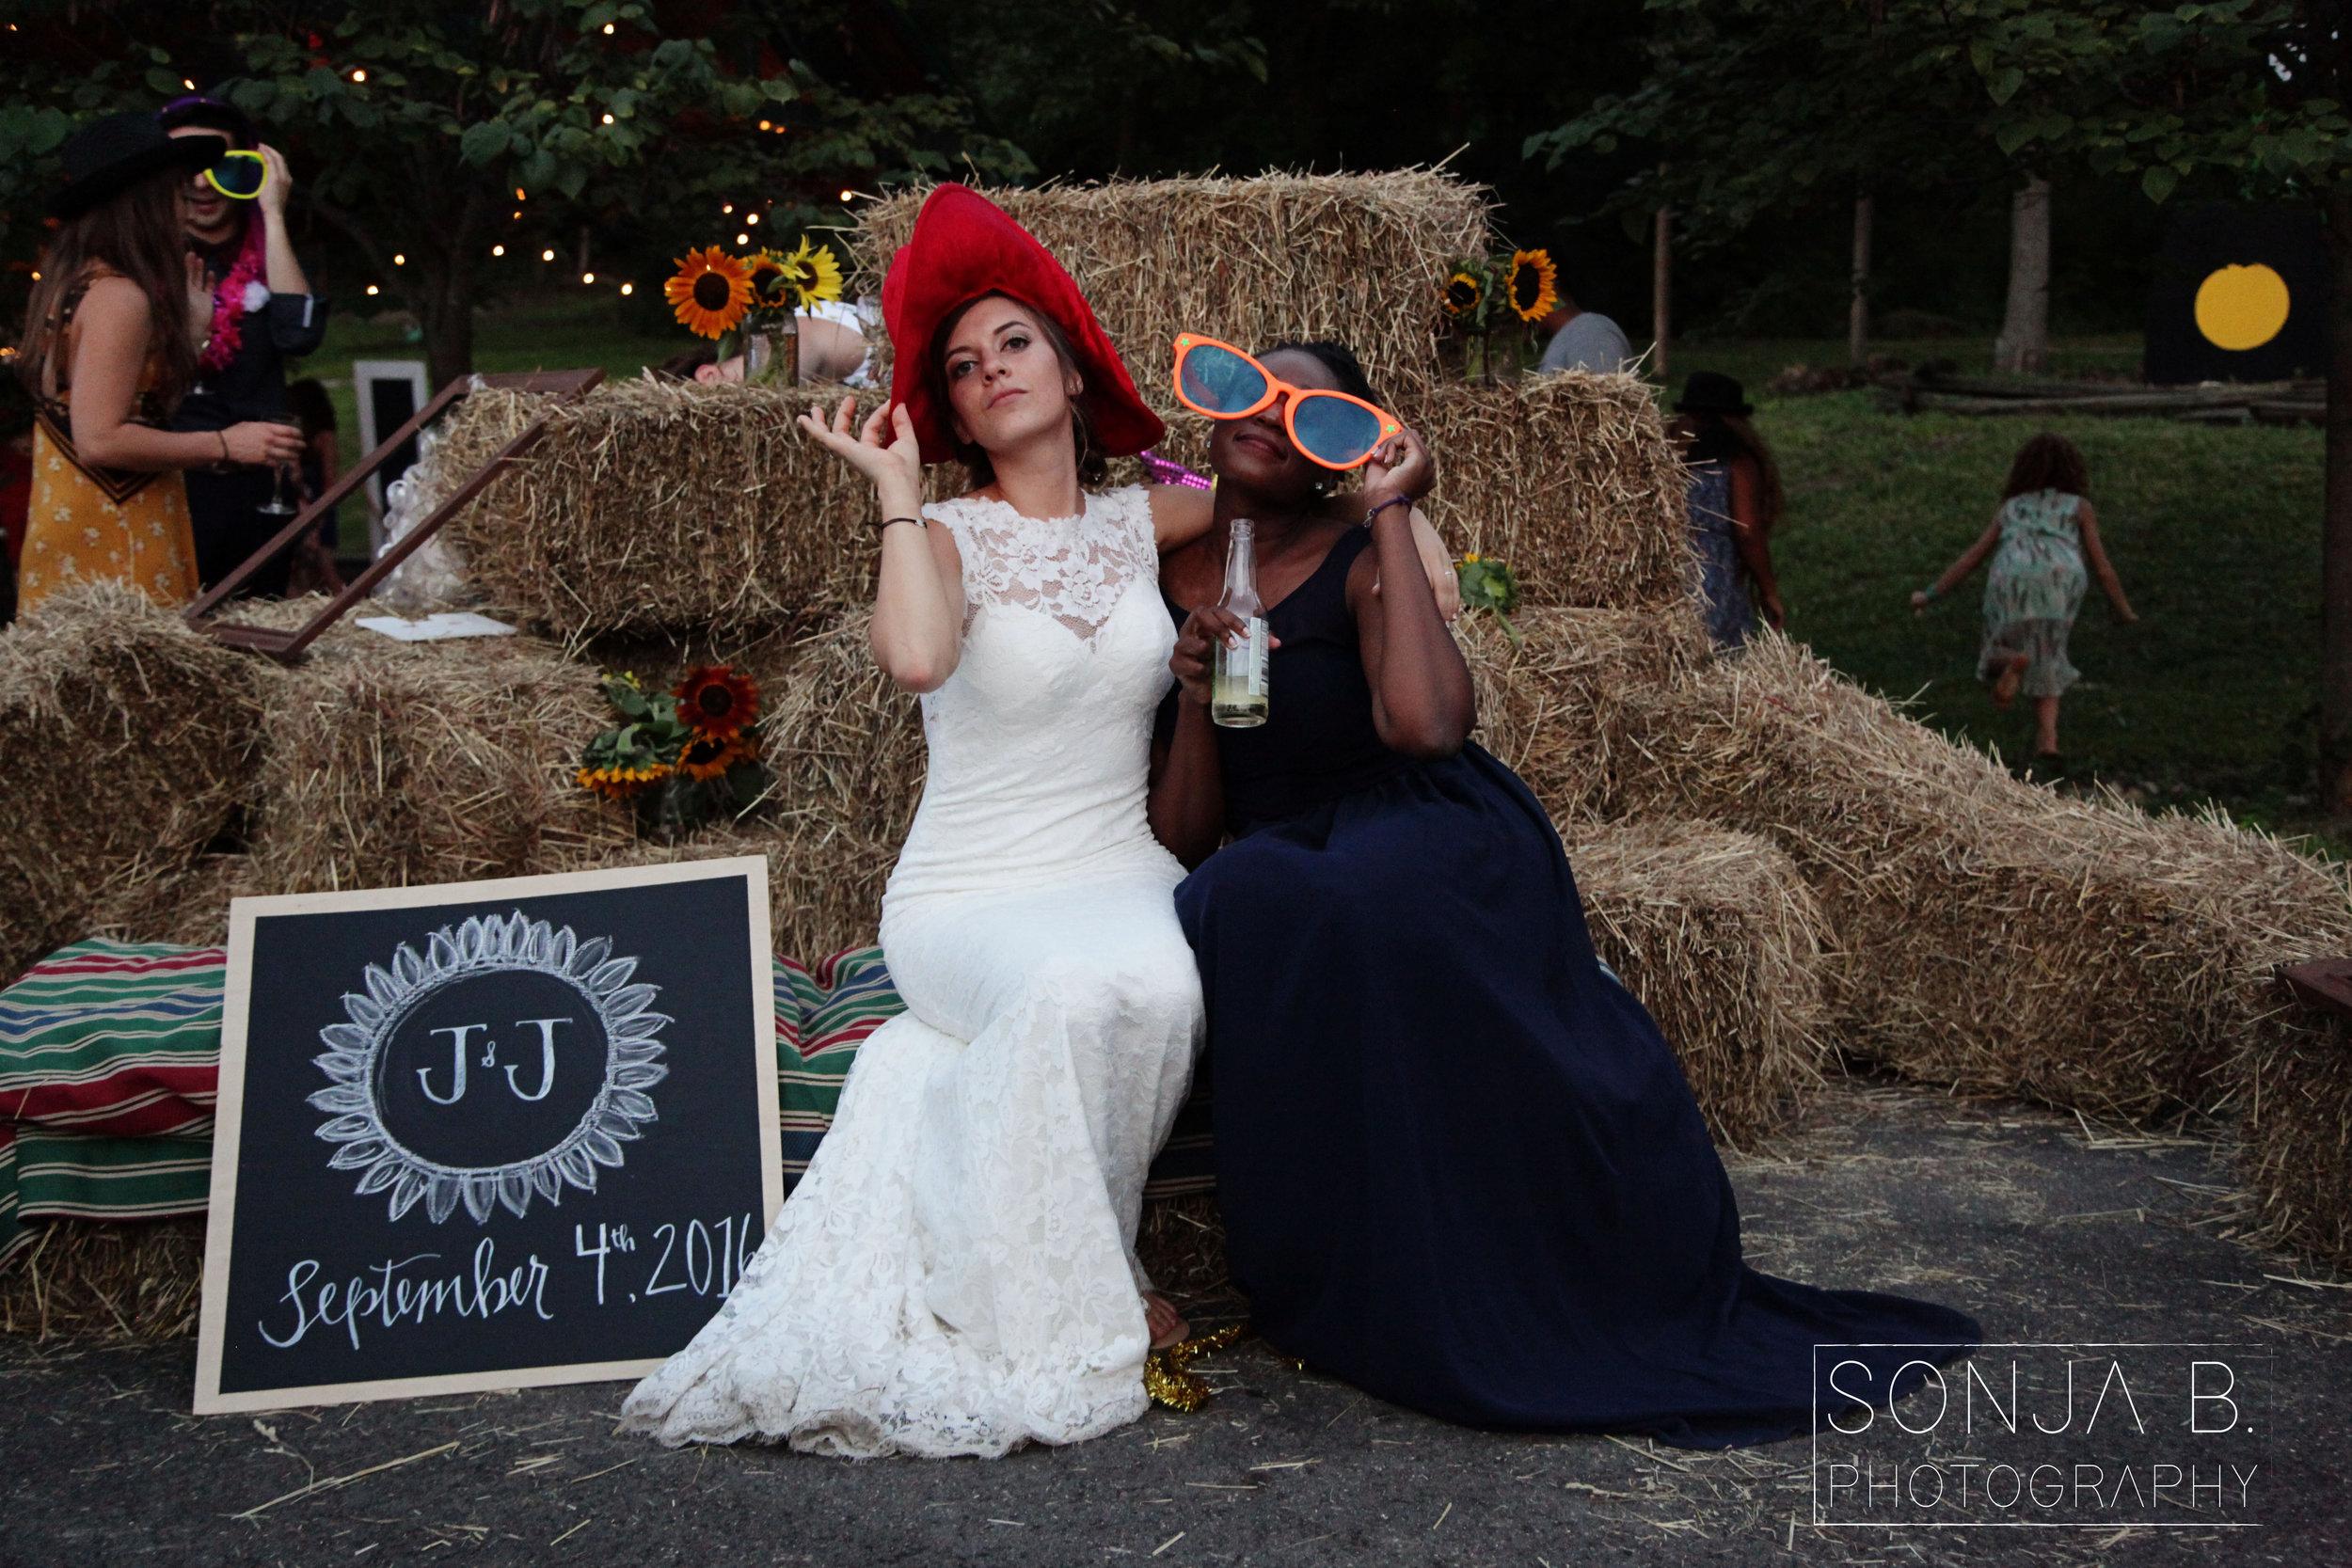 cincinnati wedding photo booth.jpg